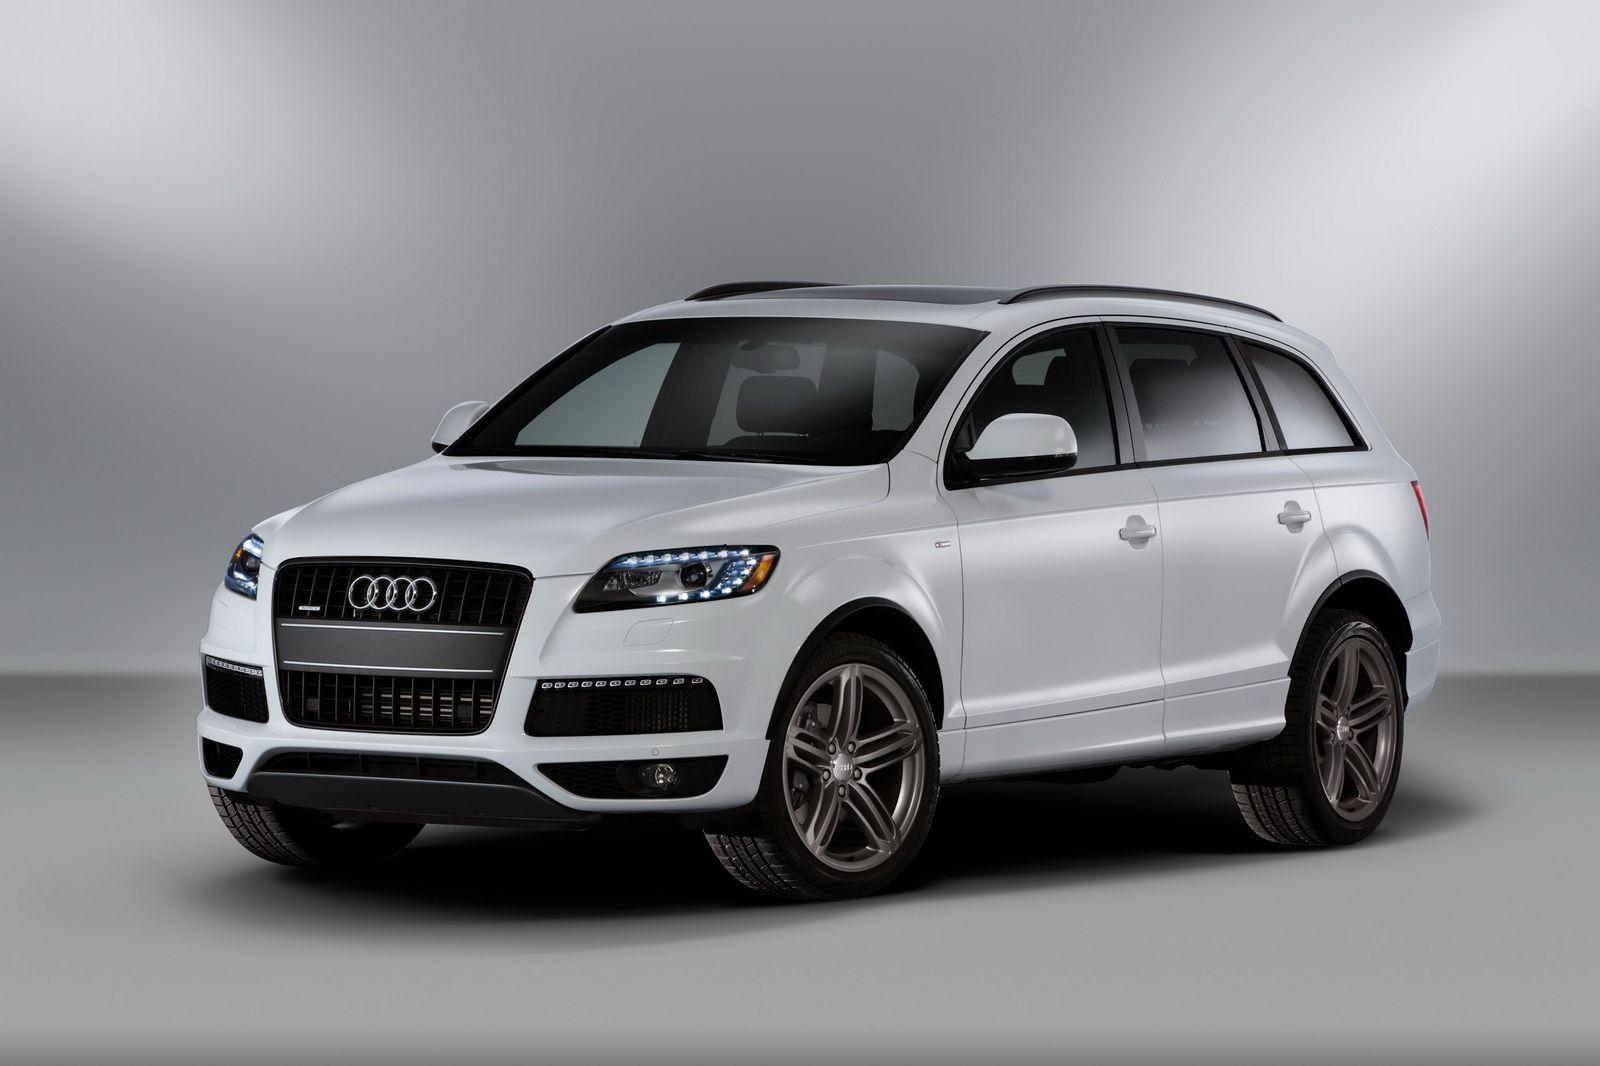 Audi Could Buy Back 25 000 Q7 Tdis In The Us Carscoops Audi Q7 Audi Q7 Tdi Audi Q7 Diesel